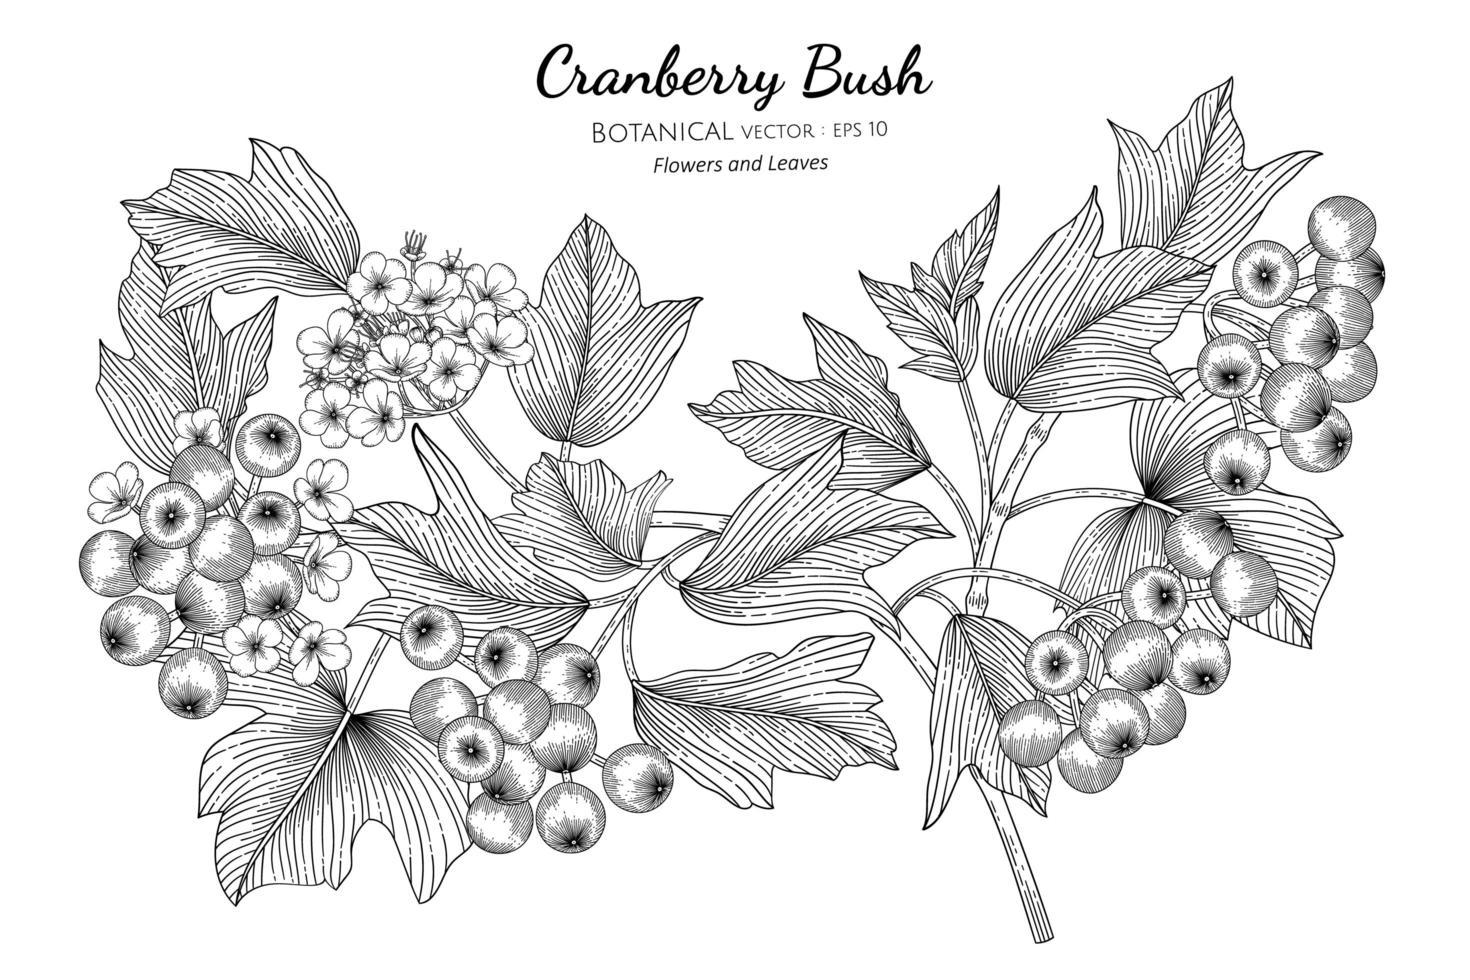 hand getekende Amerikaanse cranberry bush vector